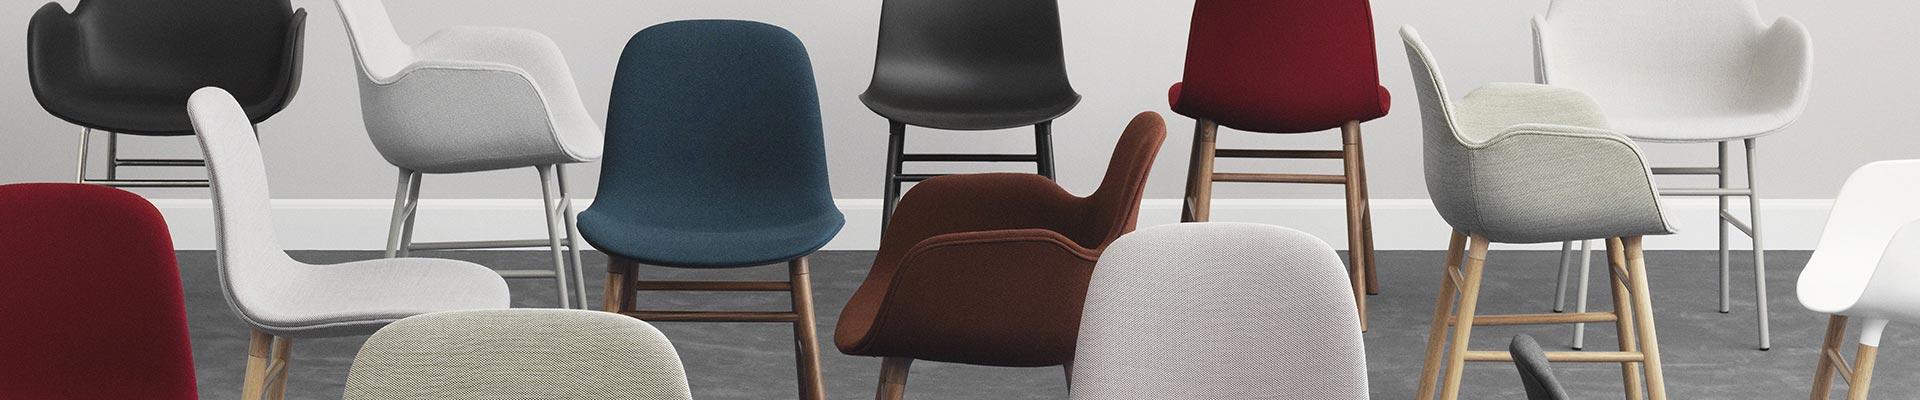 Normann Copenhagen stoelen